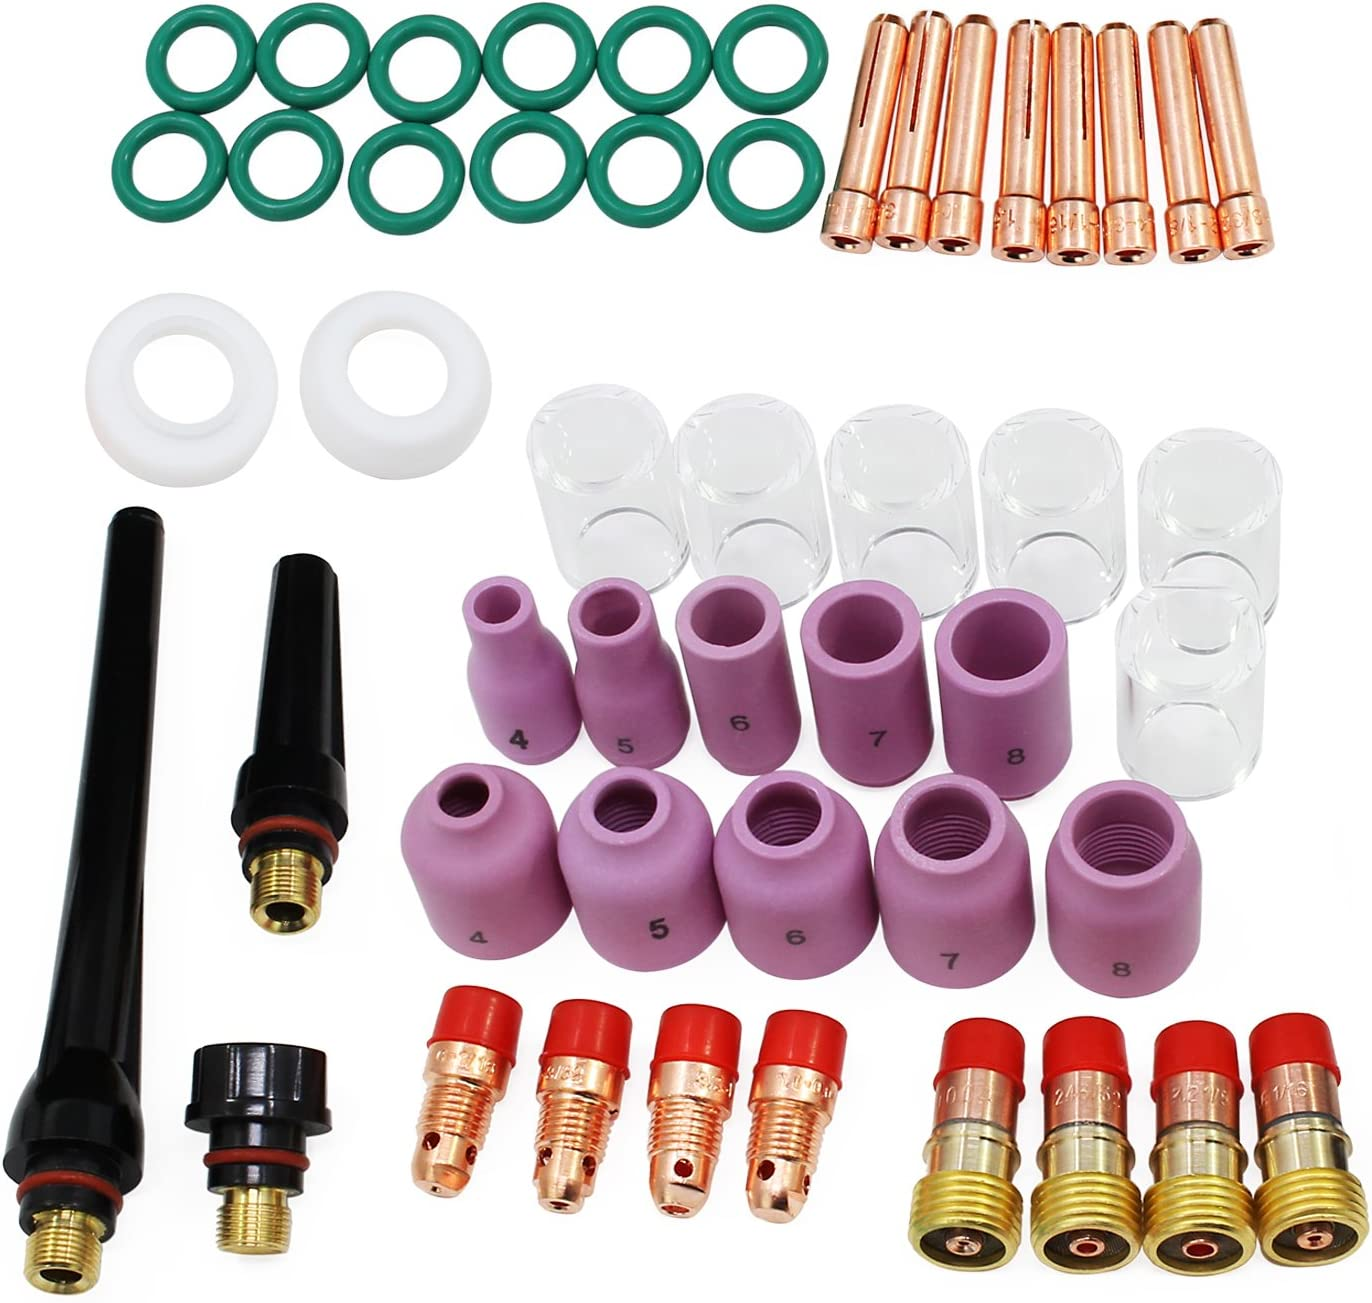 HSeaMall 49 PCS TIG Soldadura Suministros de soldadura Vástago Junta Tapa trasera a prueba de agua Pyrex Gas Glass Lenses Alum Alum Kit de accesorios para WP-17/18/26